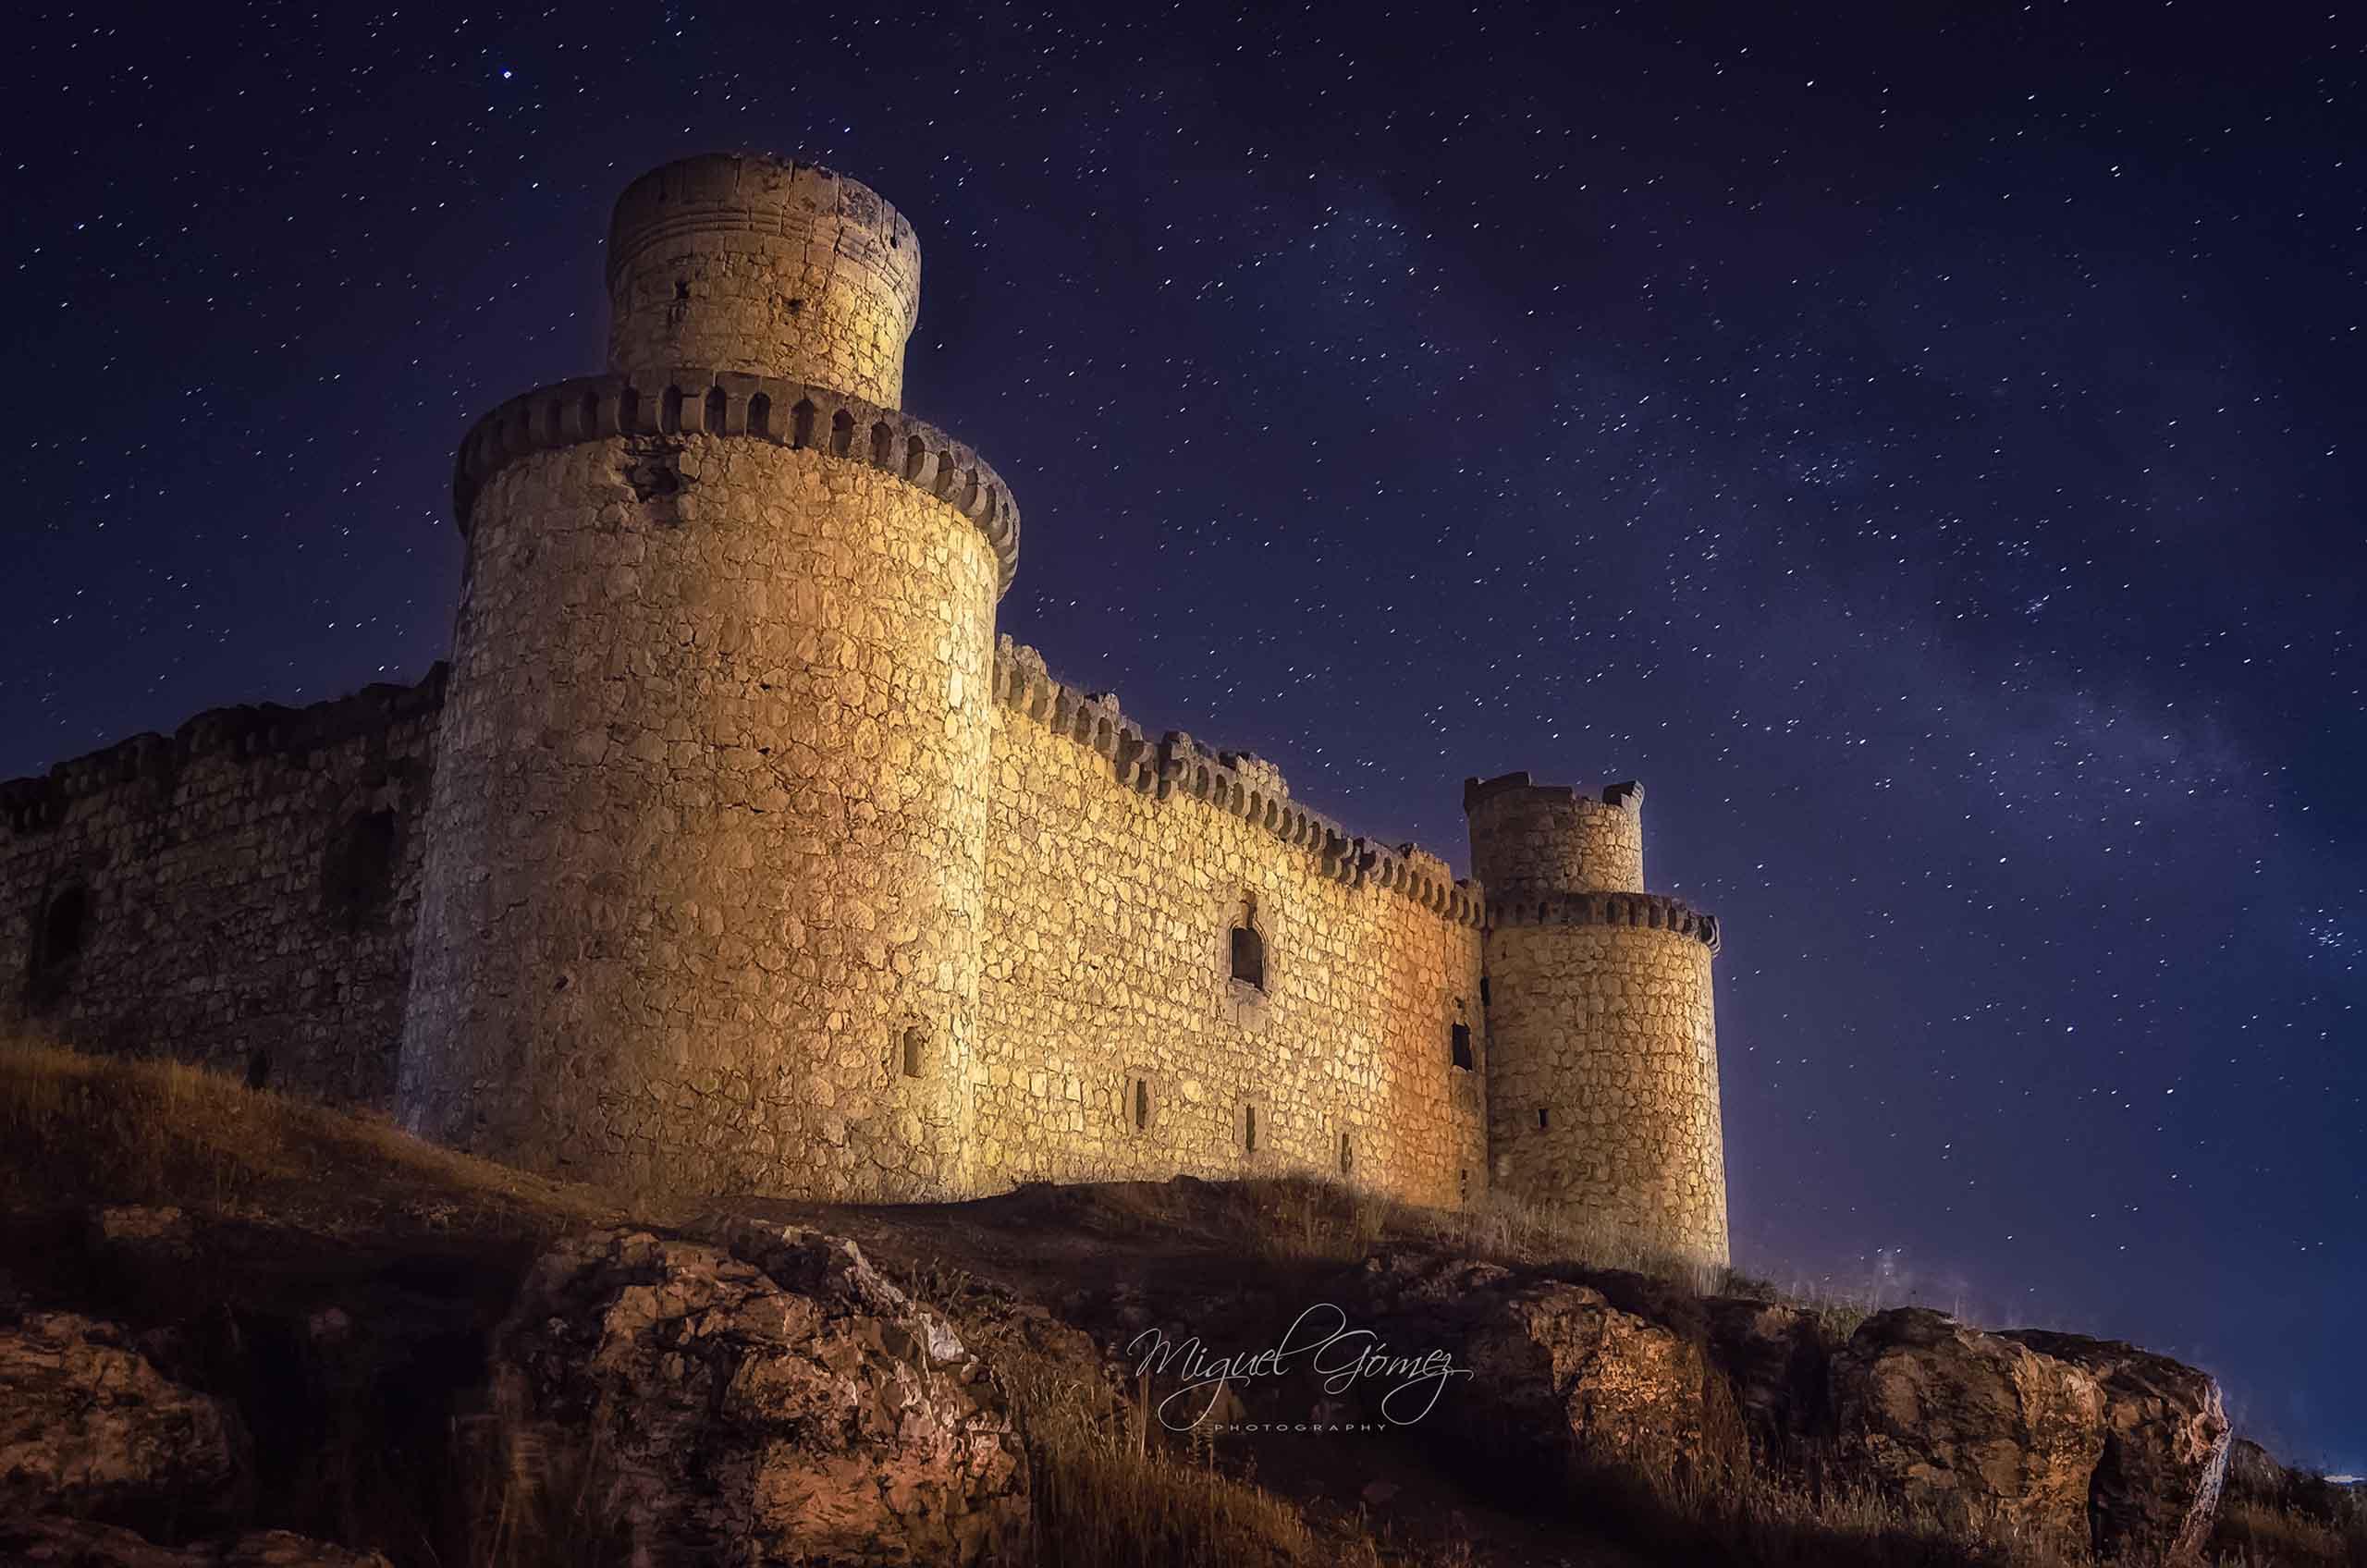 Nocturna - Castillo de Barcience